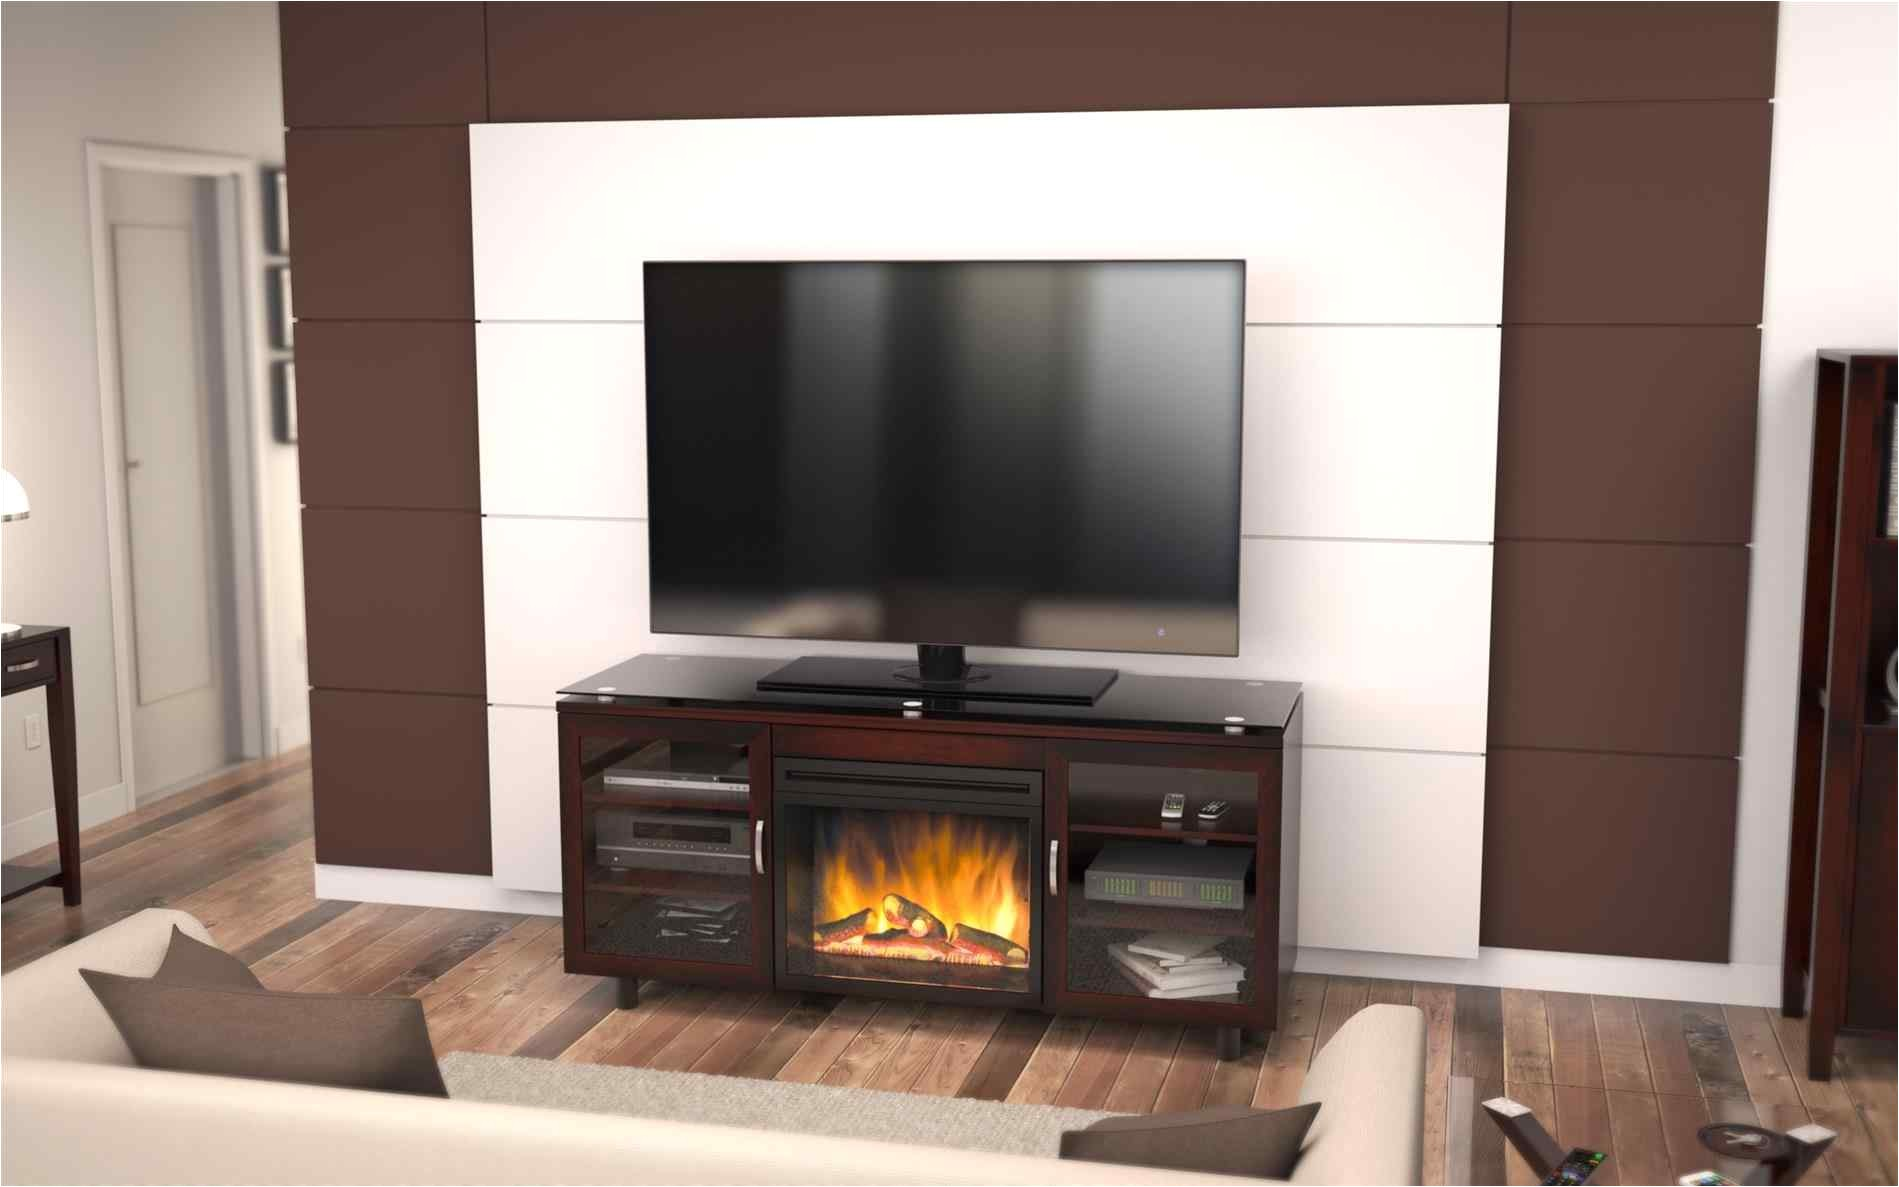 great american furniture tv stands american furniture warehouse tv stands in home design amusing signature tv american furniture tv stands stands jpg